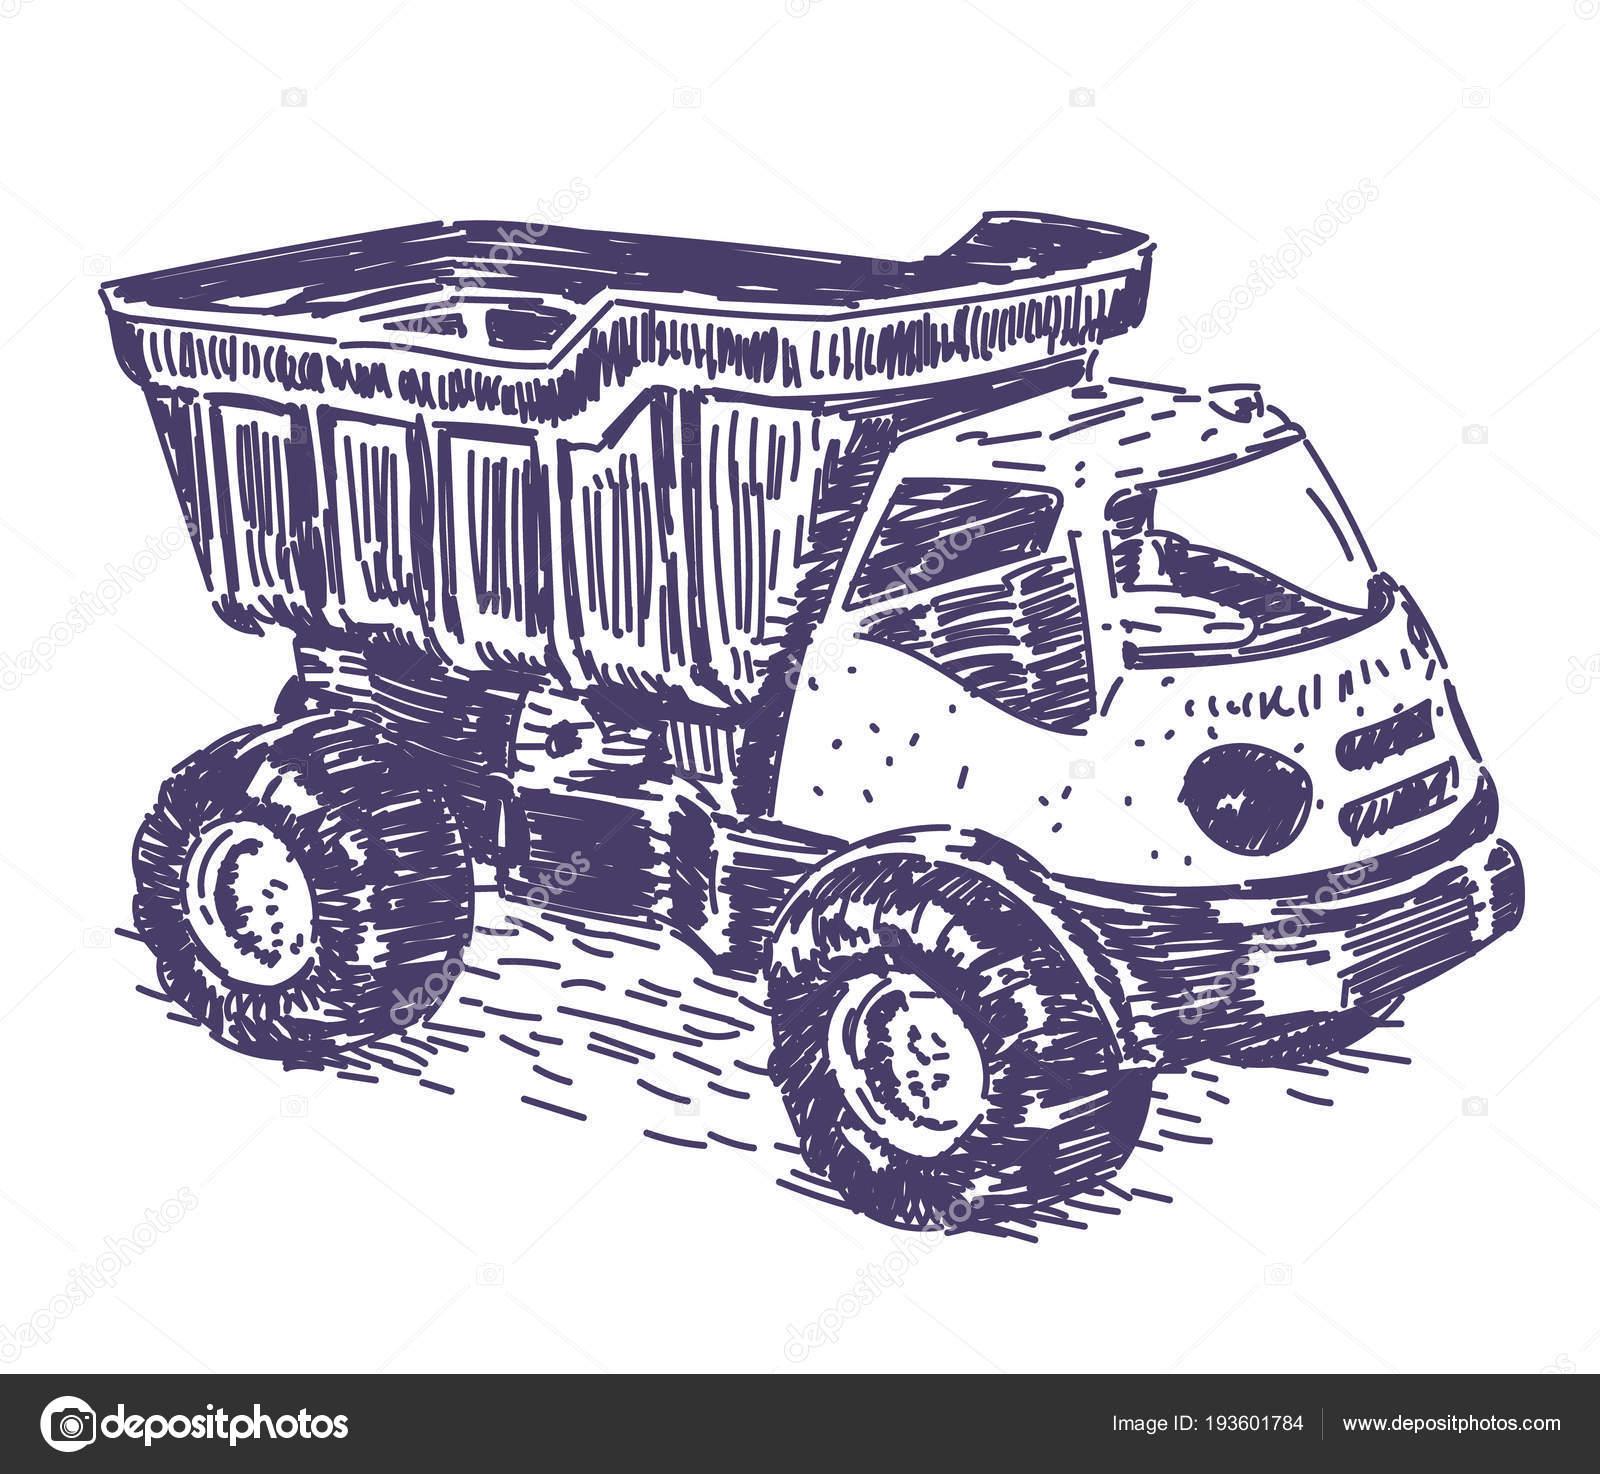 Dibujo Vectorial De Carro De Juguete Vector De Stock C Noundo